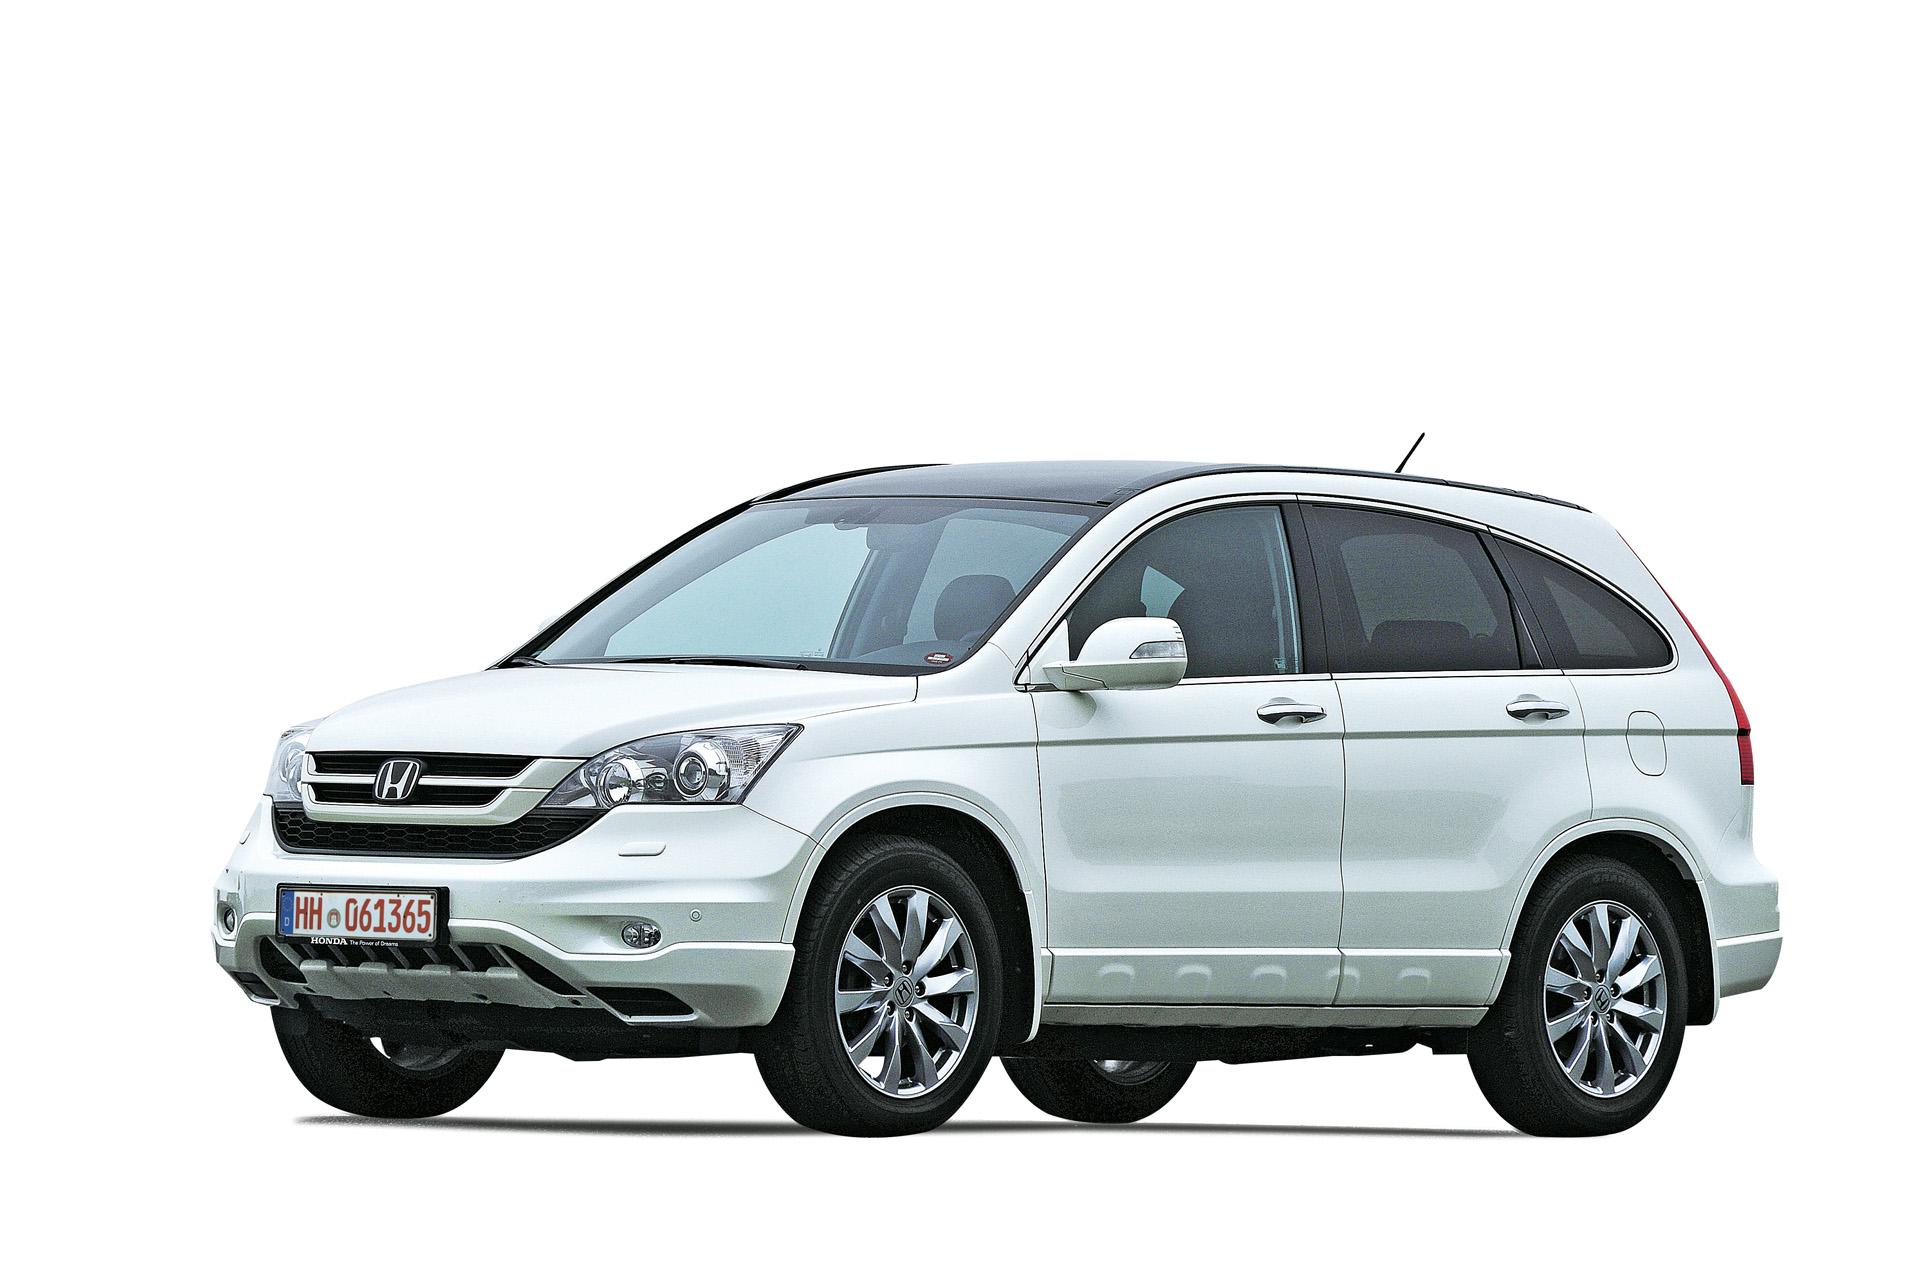 Suv >> Honda CRV - AUTO BILD